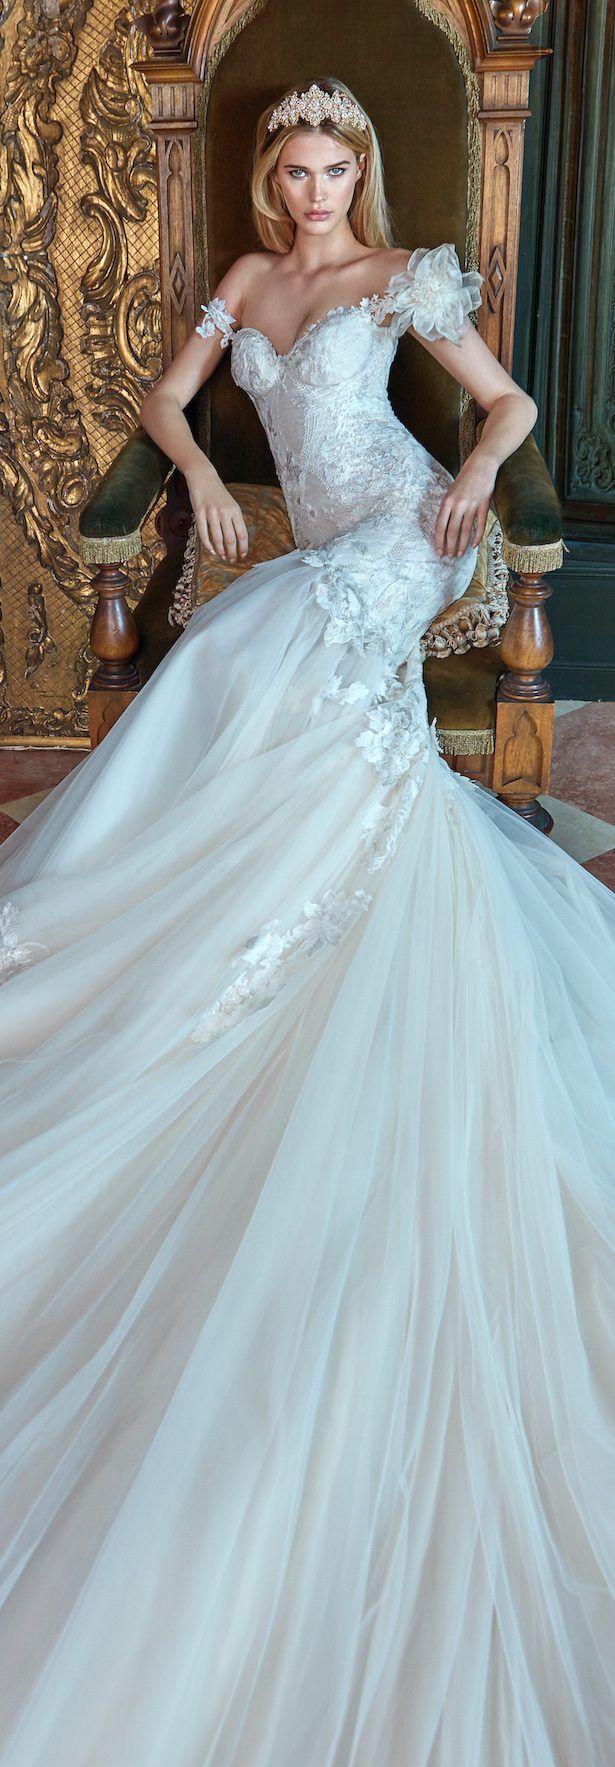 After wedding dress reception   best Wedding dresses images on Pinterest  Princess fancy dress